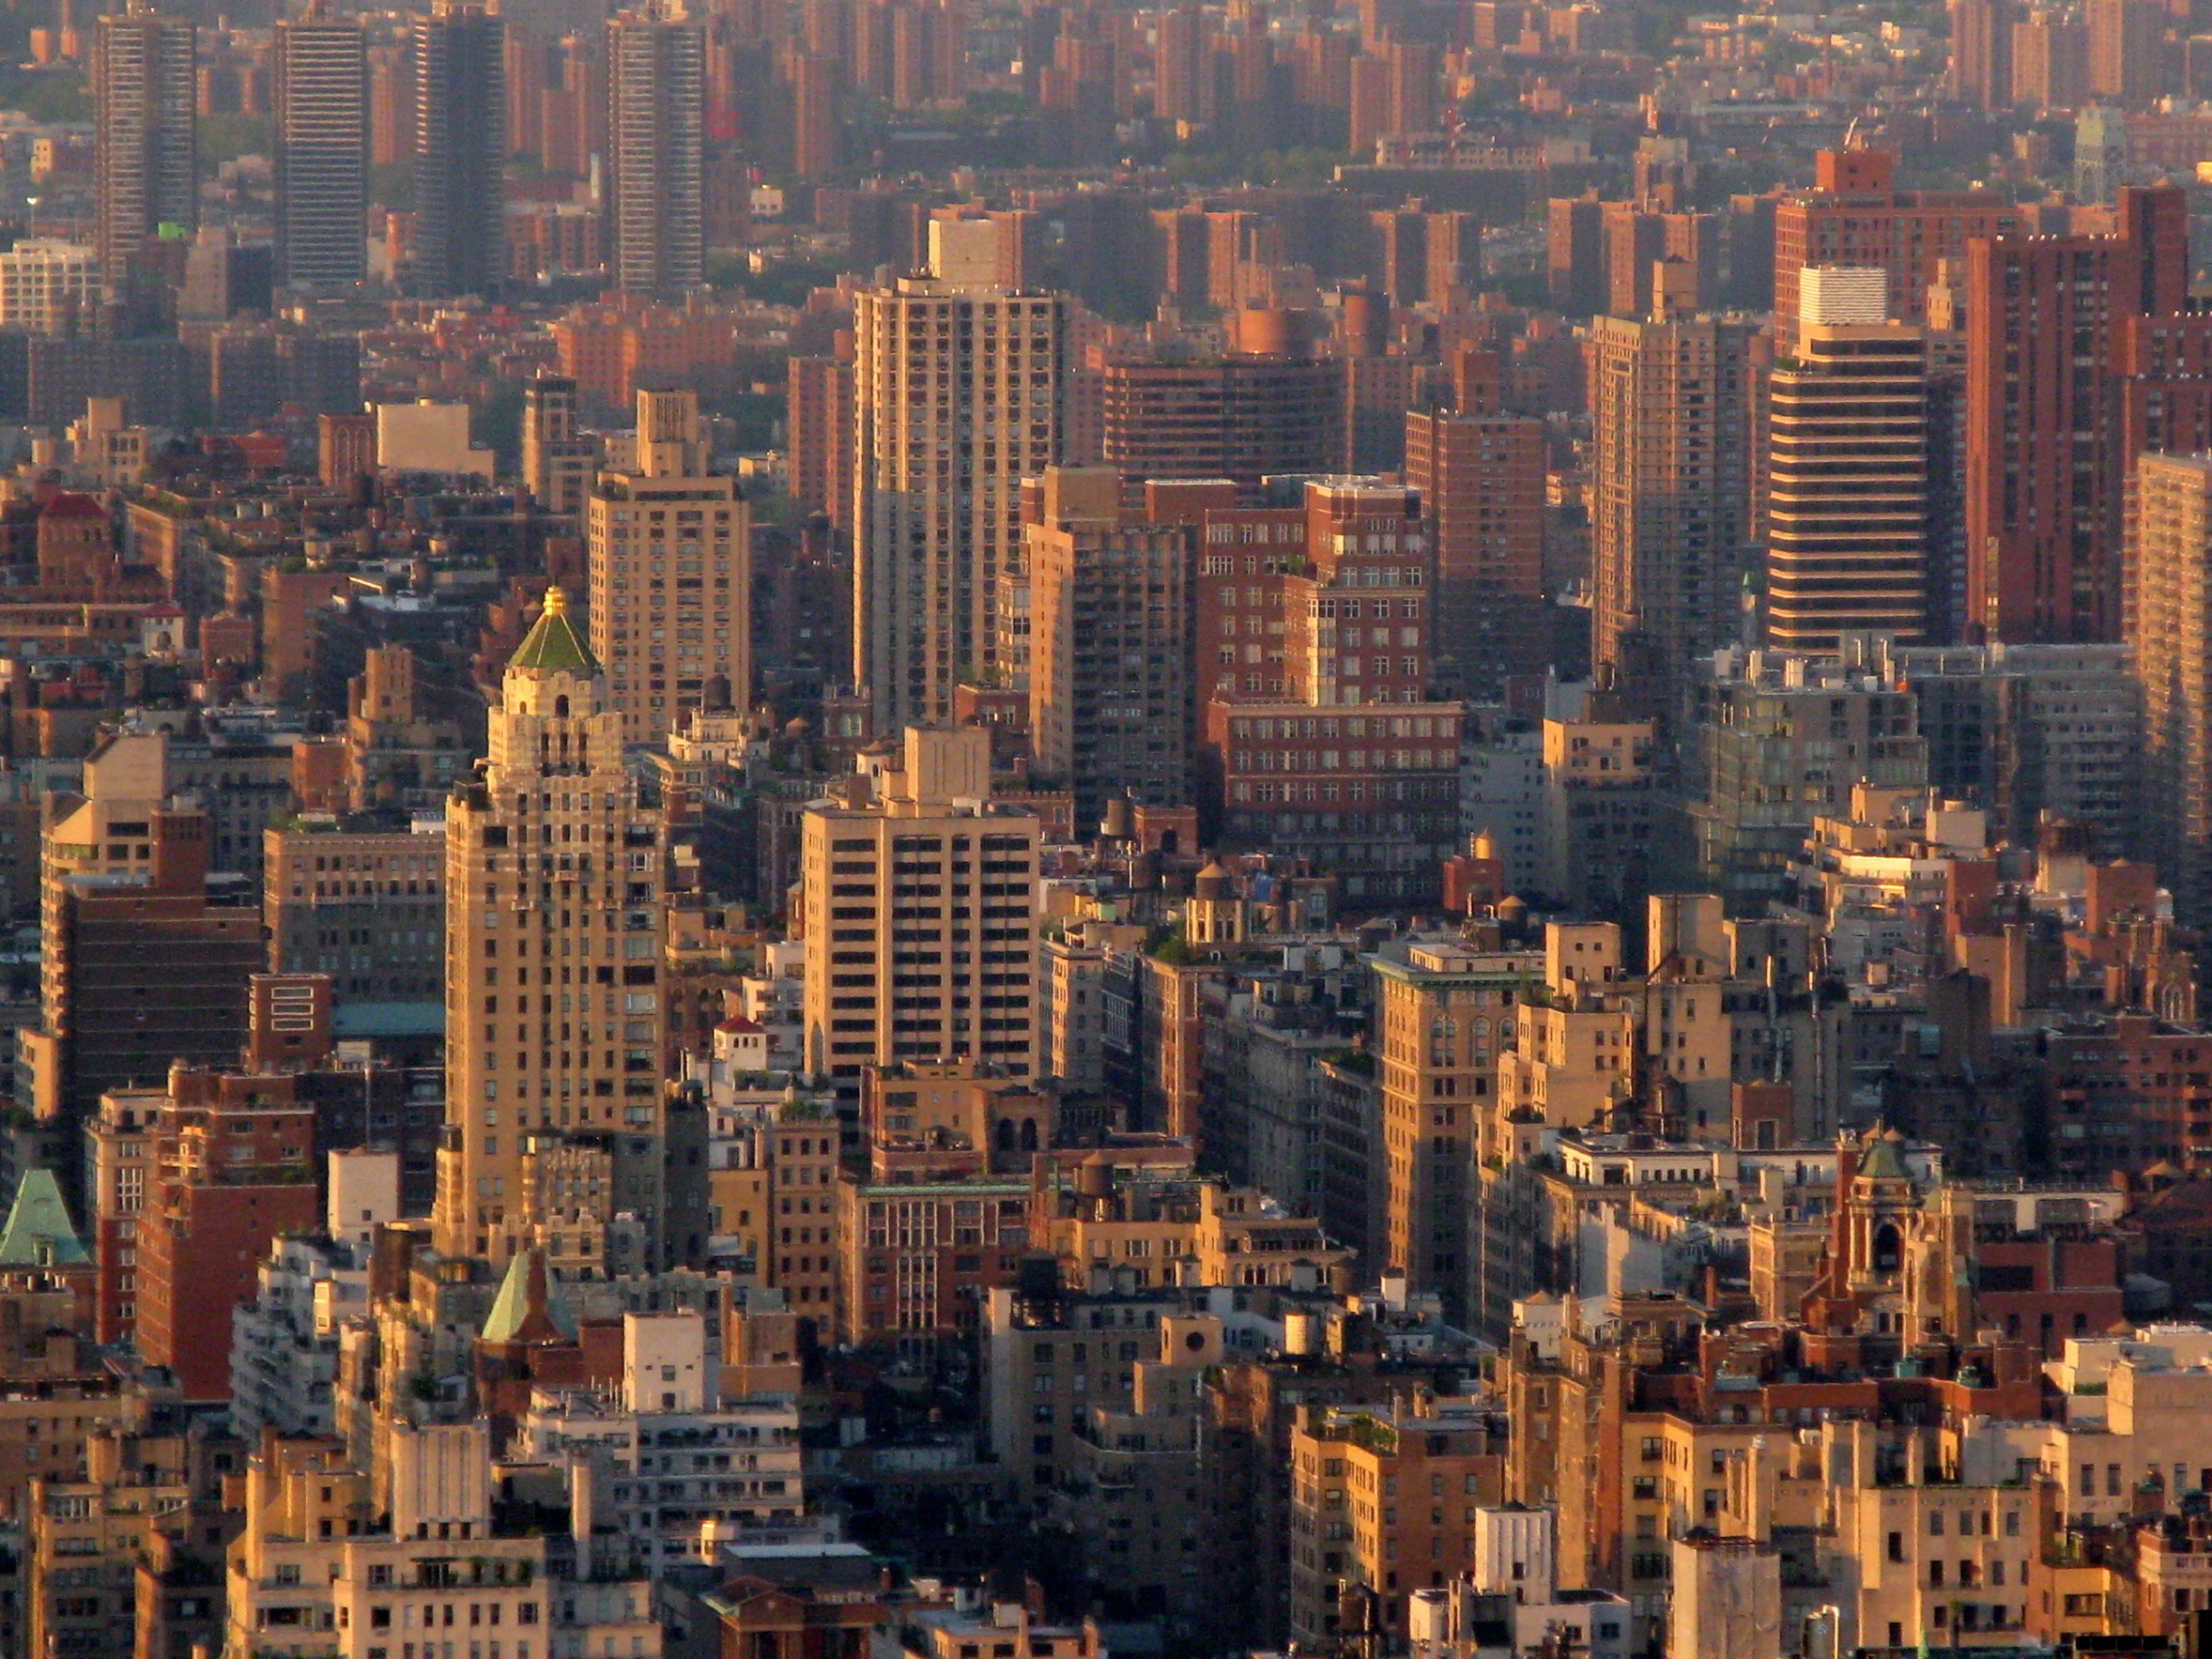 Wallpaper City Cityscape Architecture Building Sky